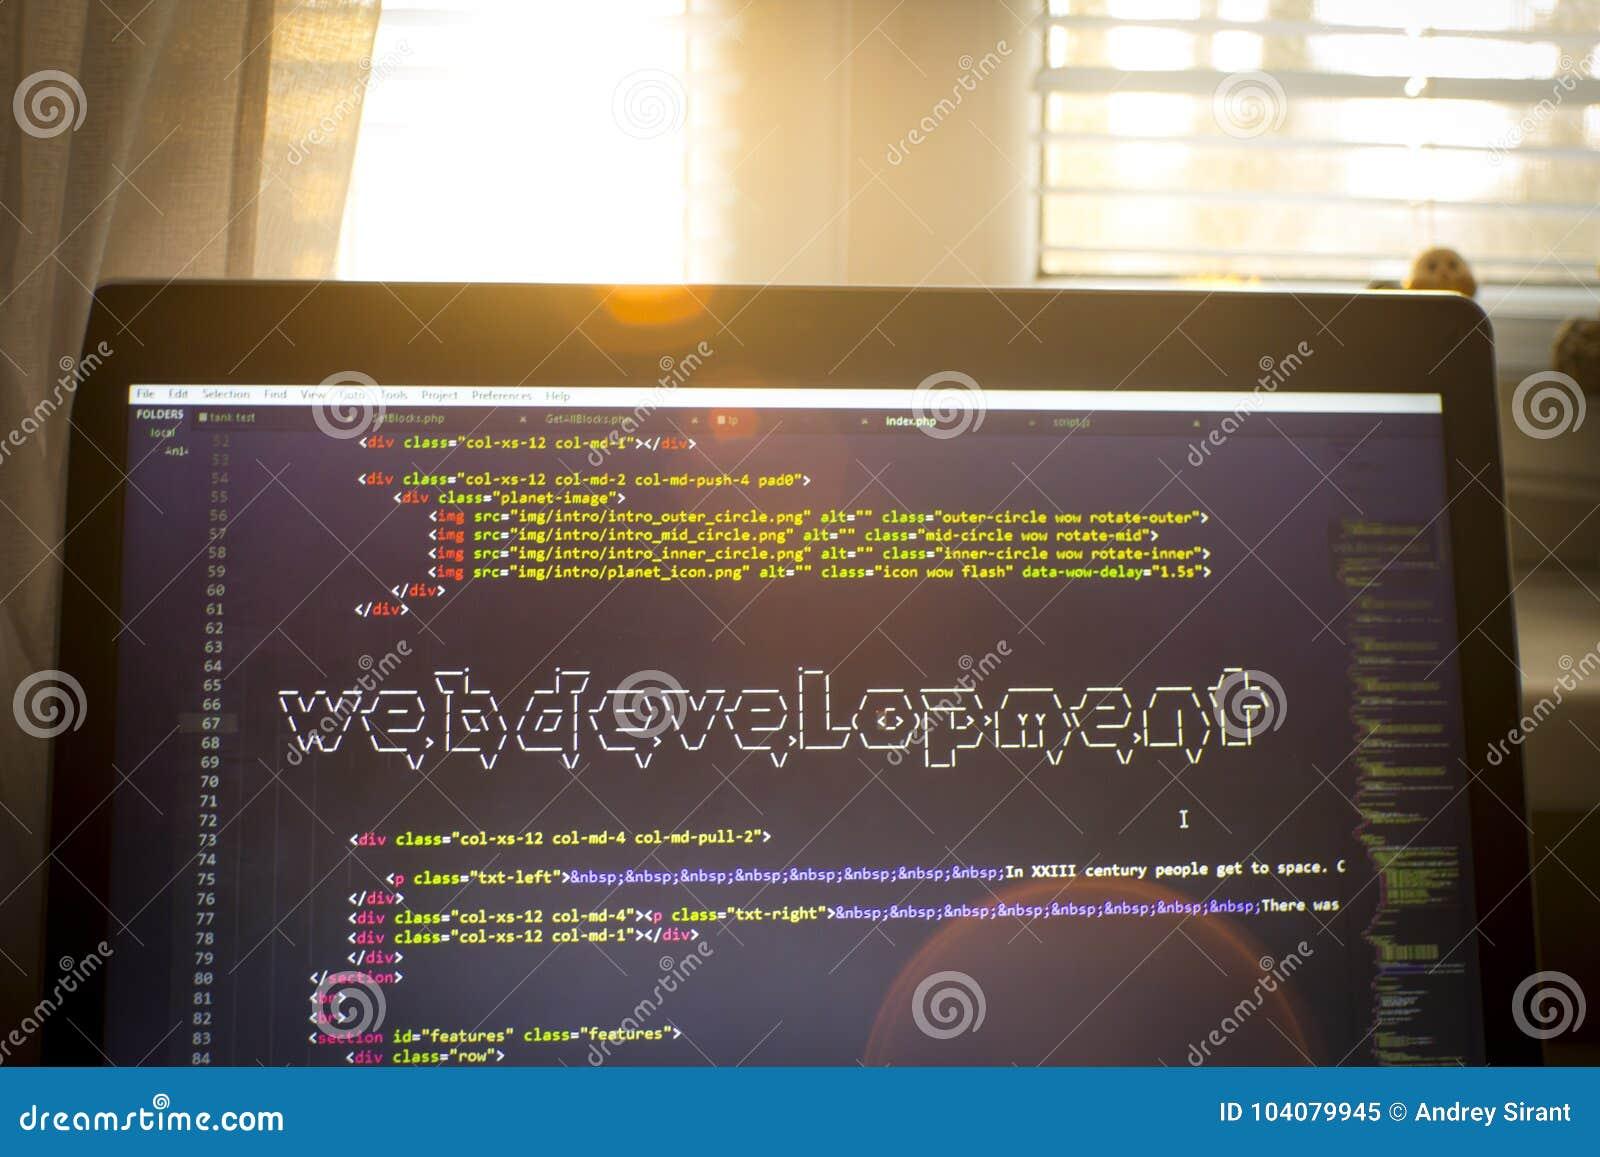 Web Development Phrase ASCII Art Inside Real HTML Code Stock